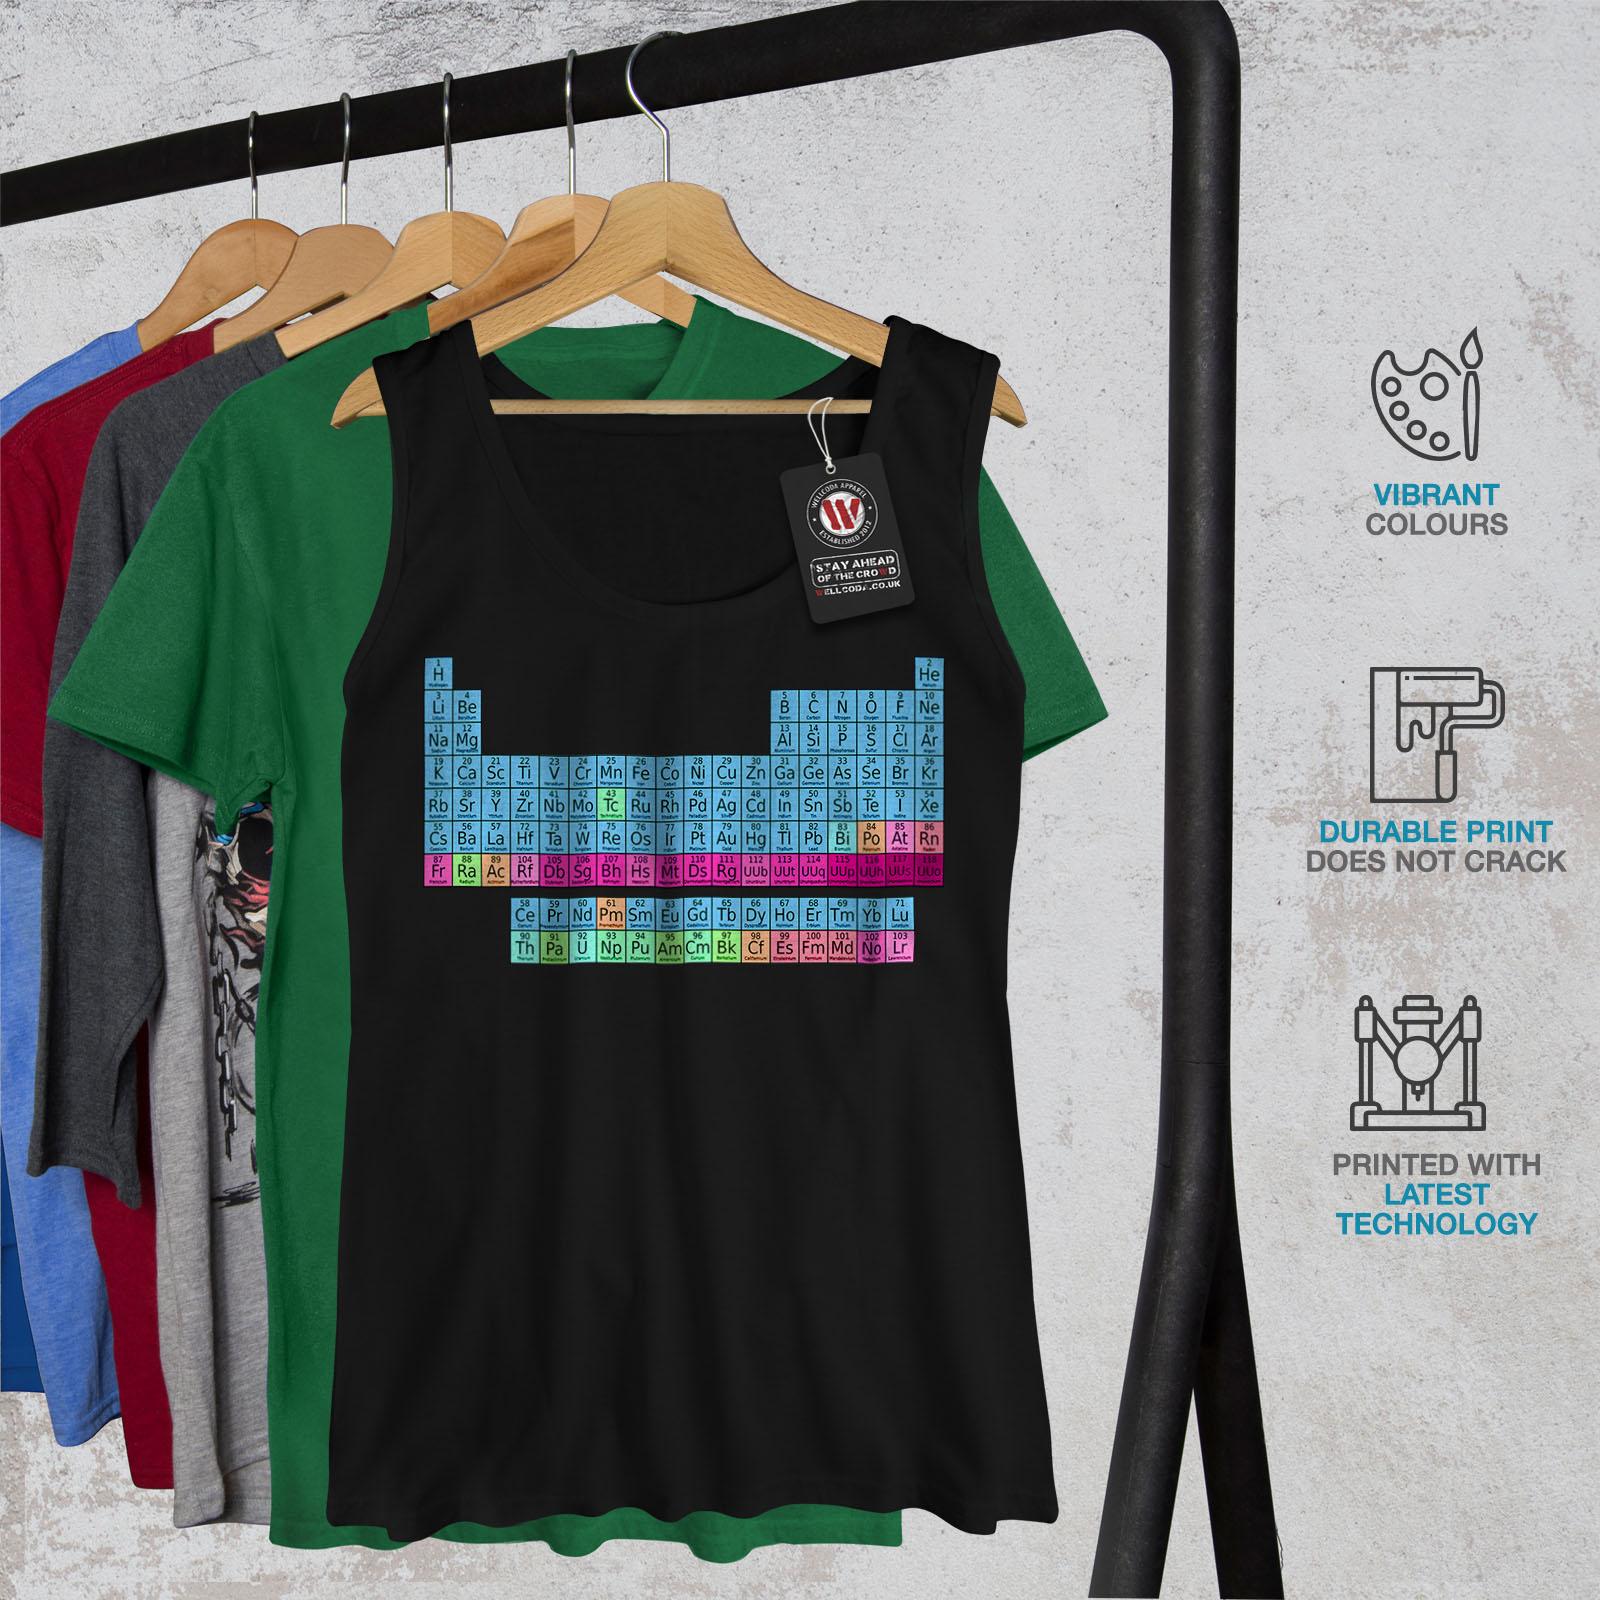 Chemistry Graphic Design Tee Wellcoda Periodic Table Womens V-Neck T-shirt